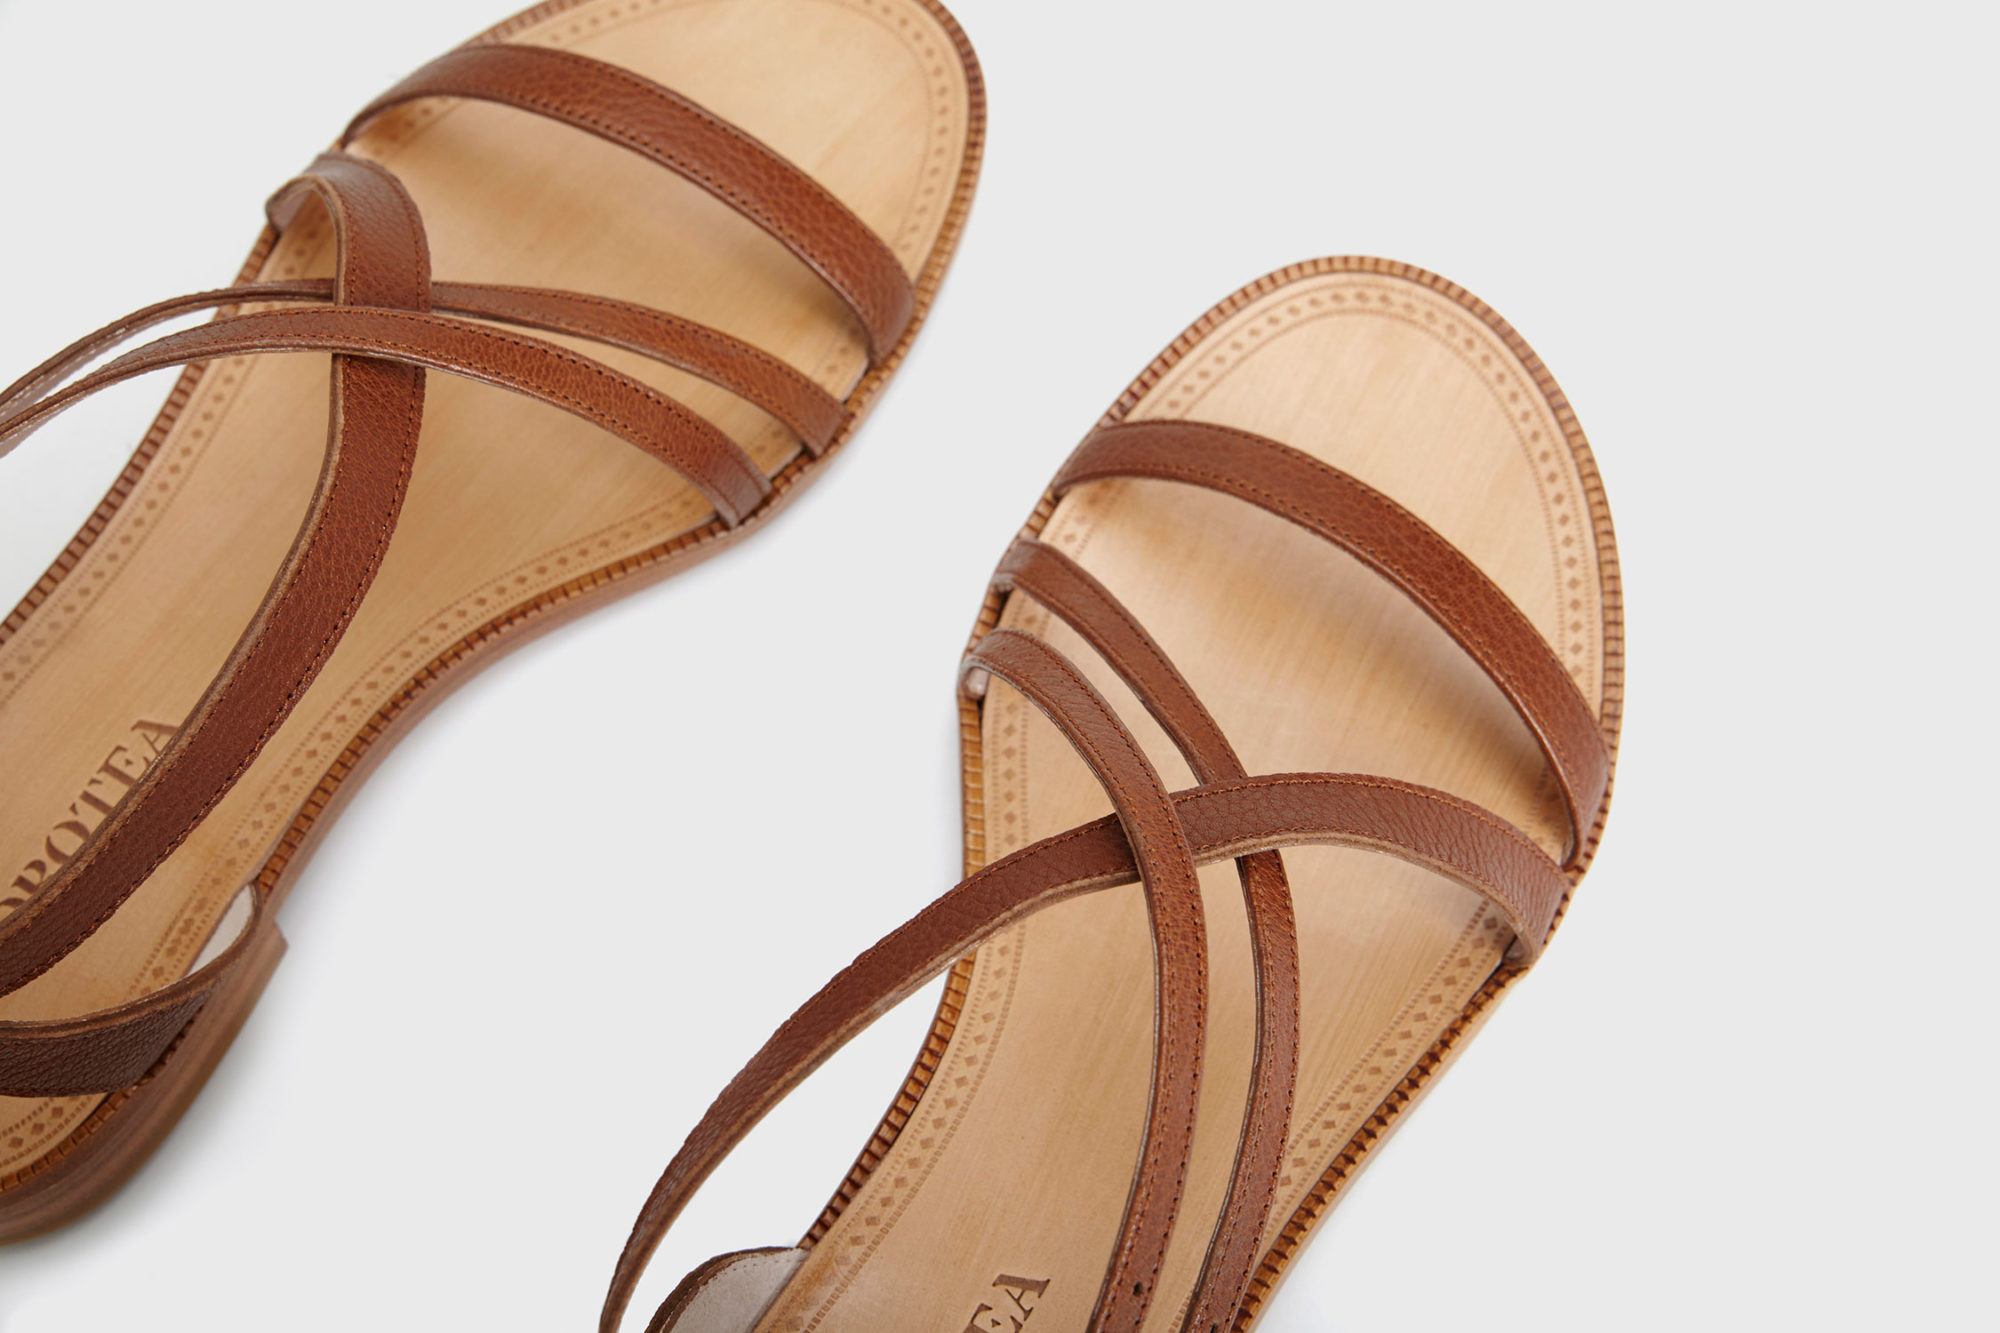 Dorotea sandalia plana Charlotte marrón ss17 detalle